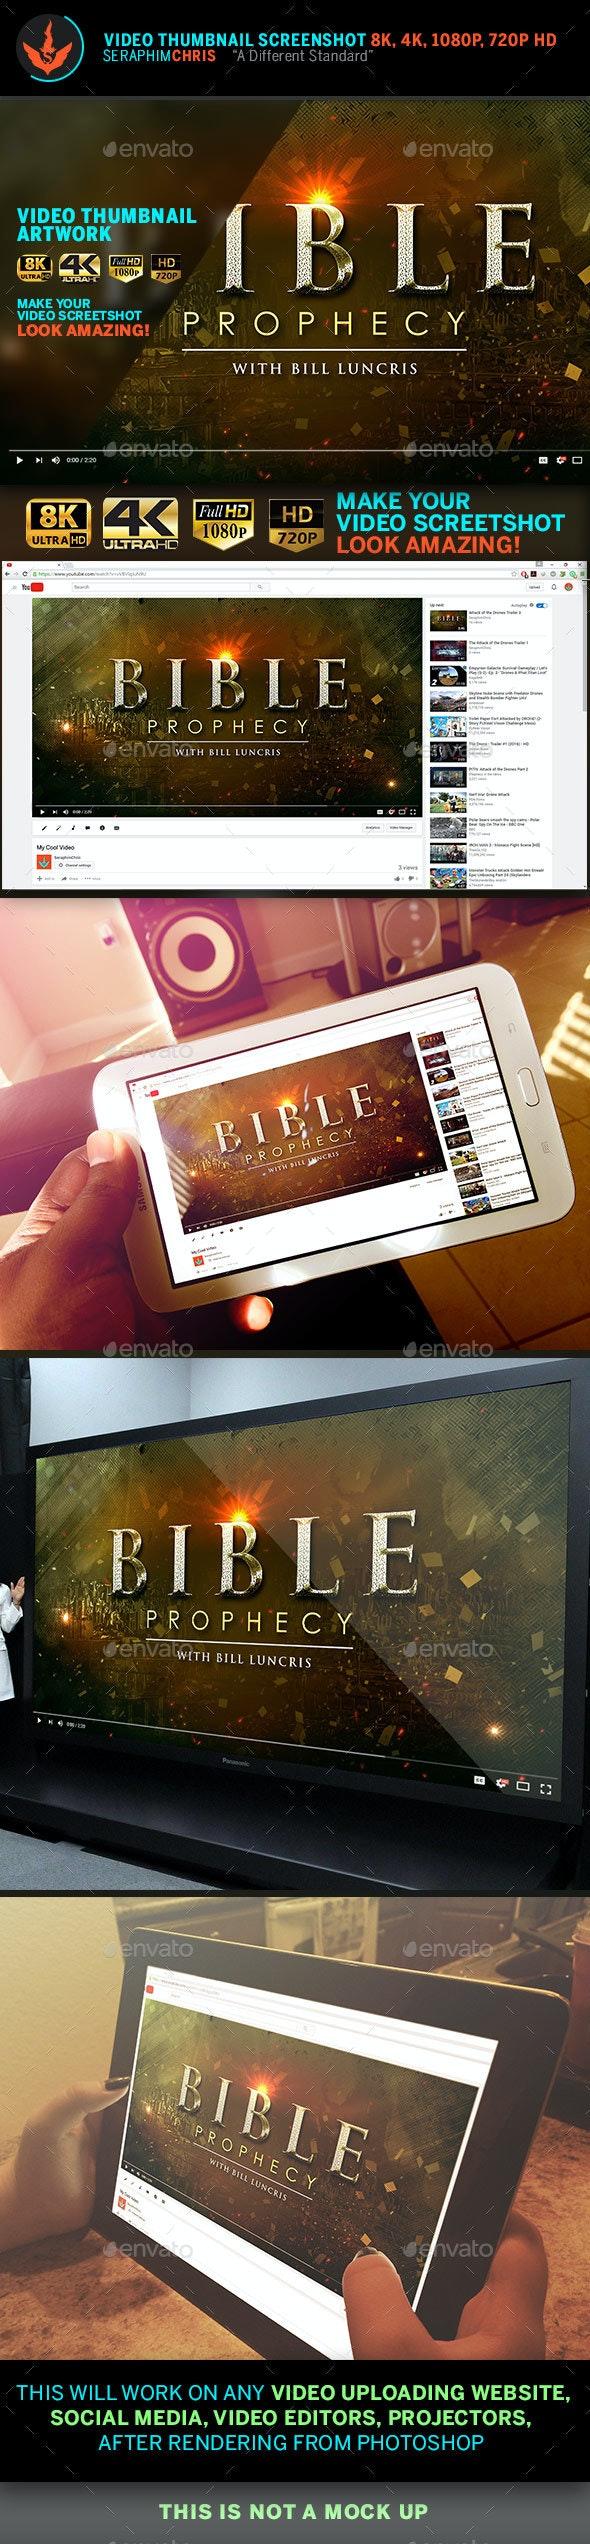 Bible Prophecy YouTube Video Thumbnail Screenshot Template - YouTube Social Media